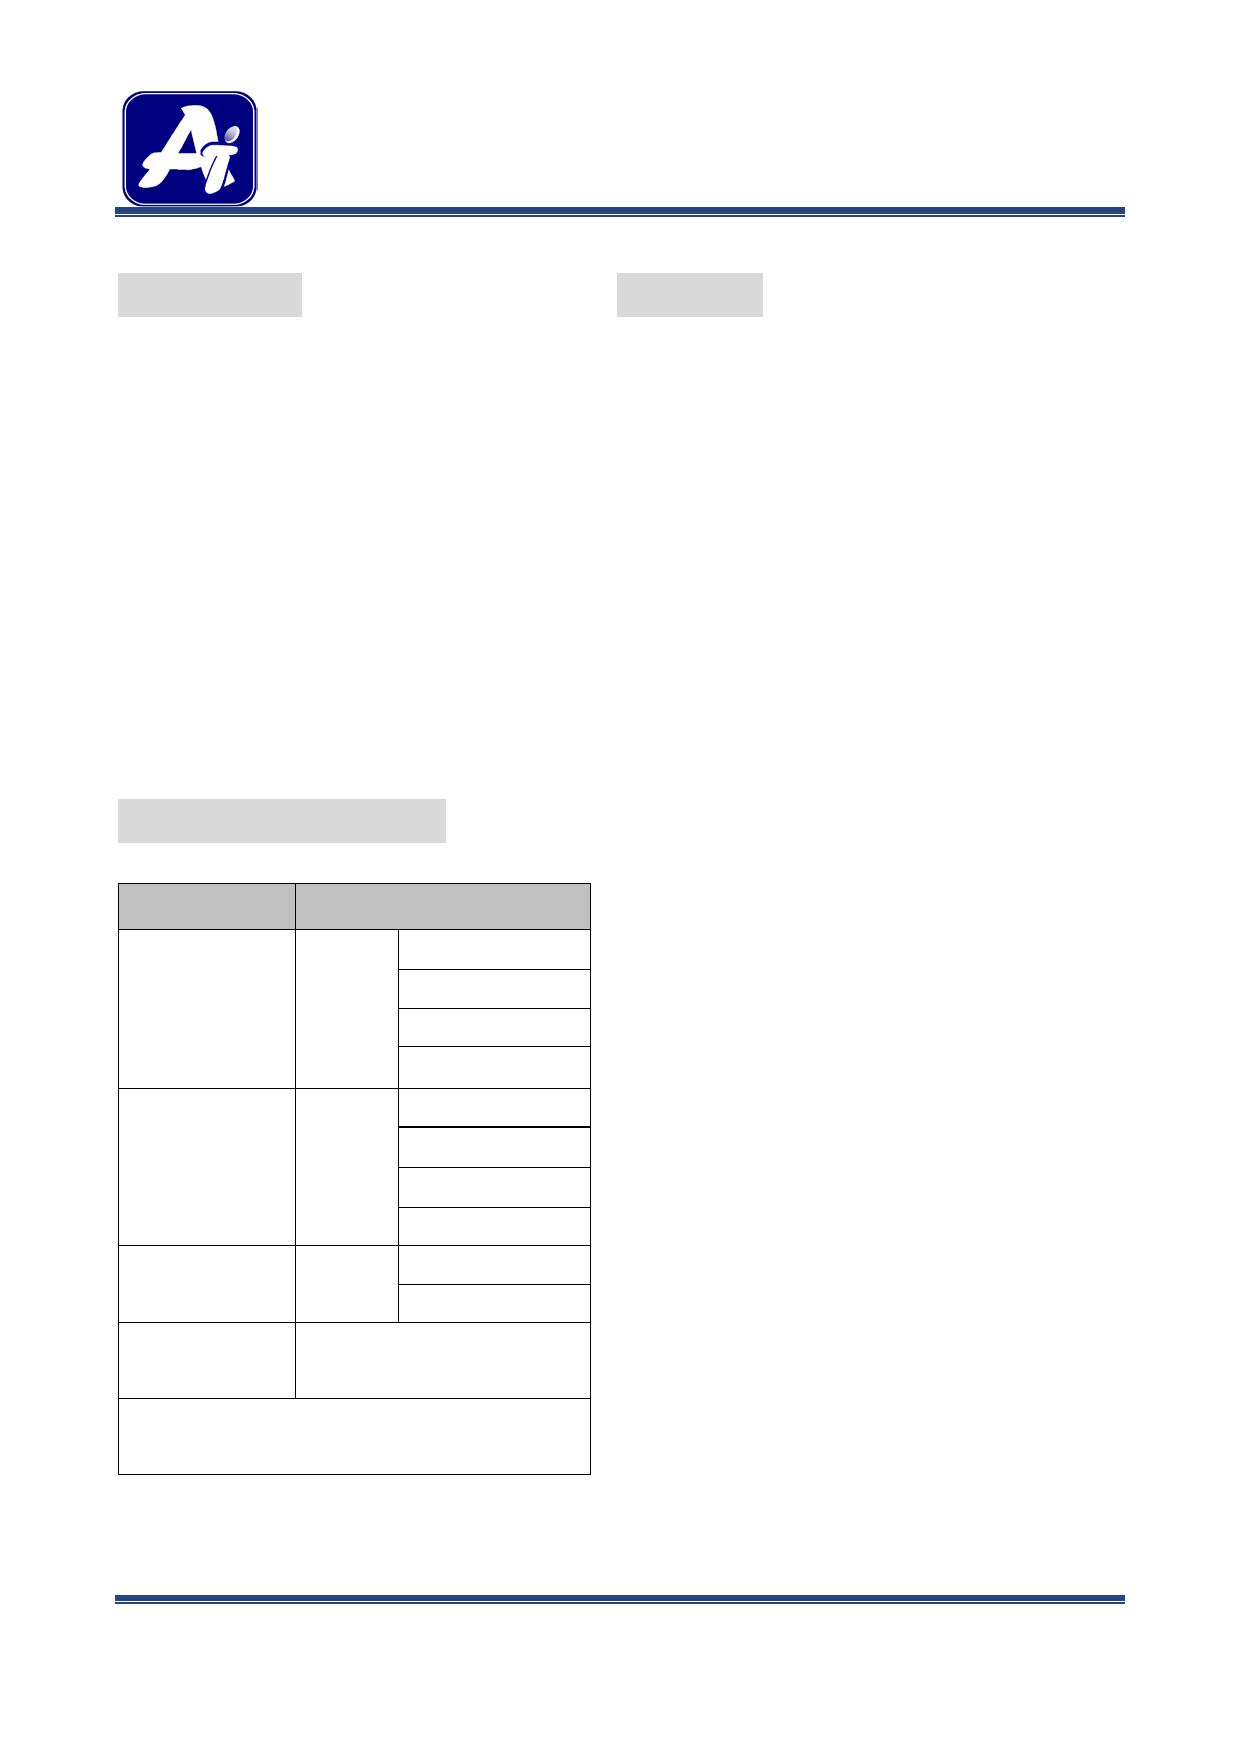 A24C08 datasheet, circuit